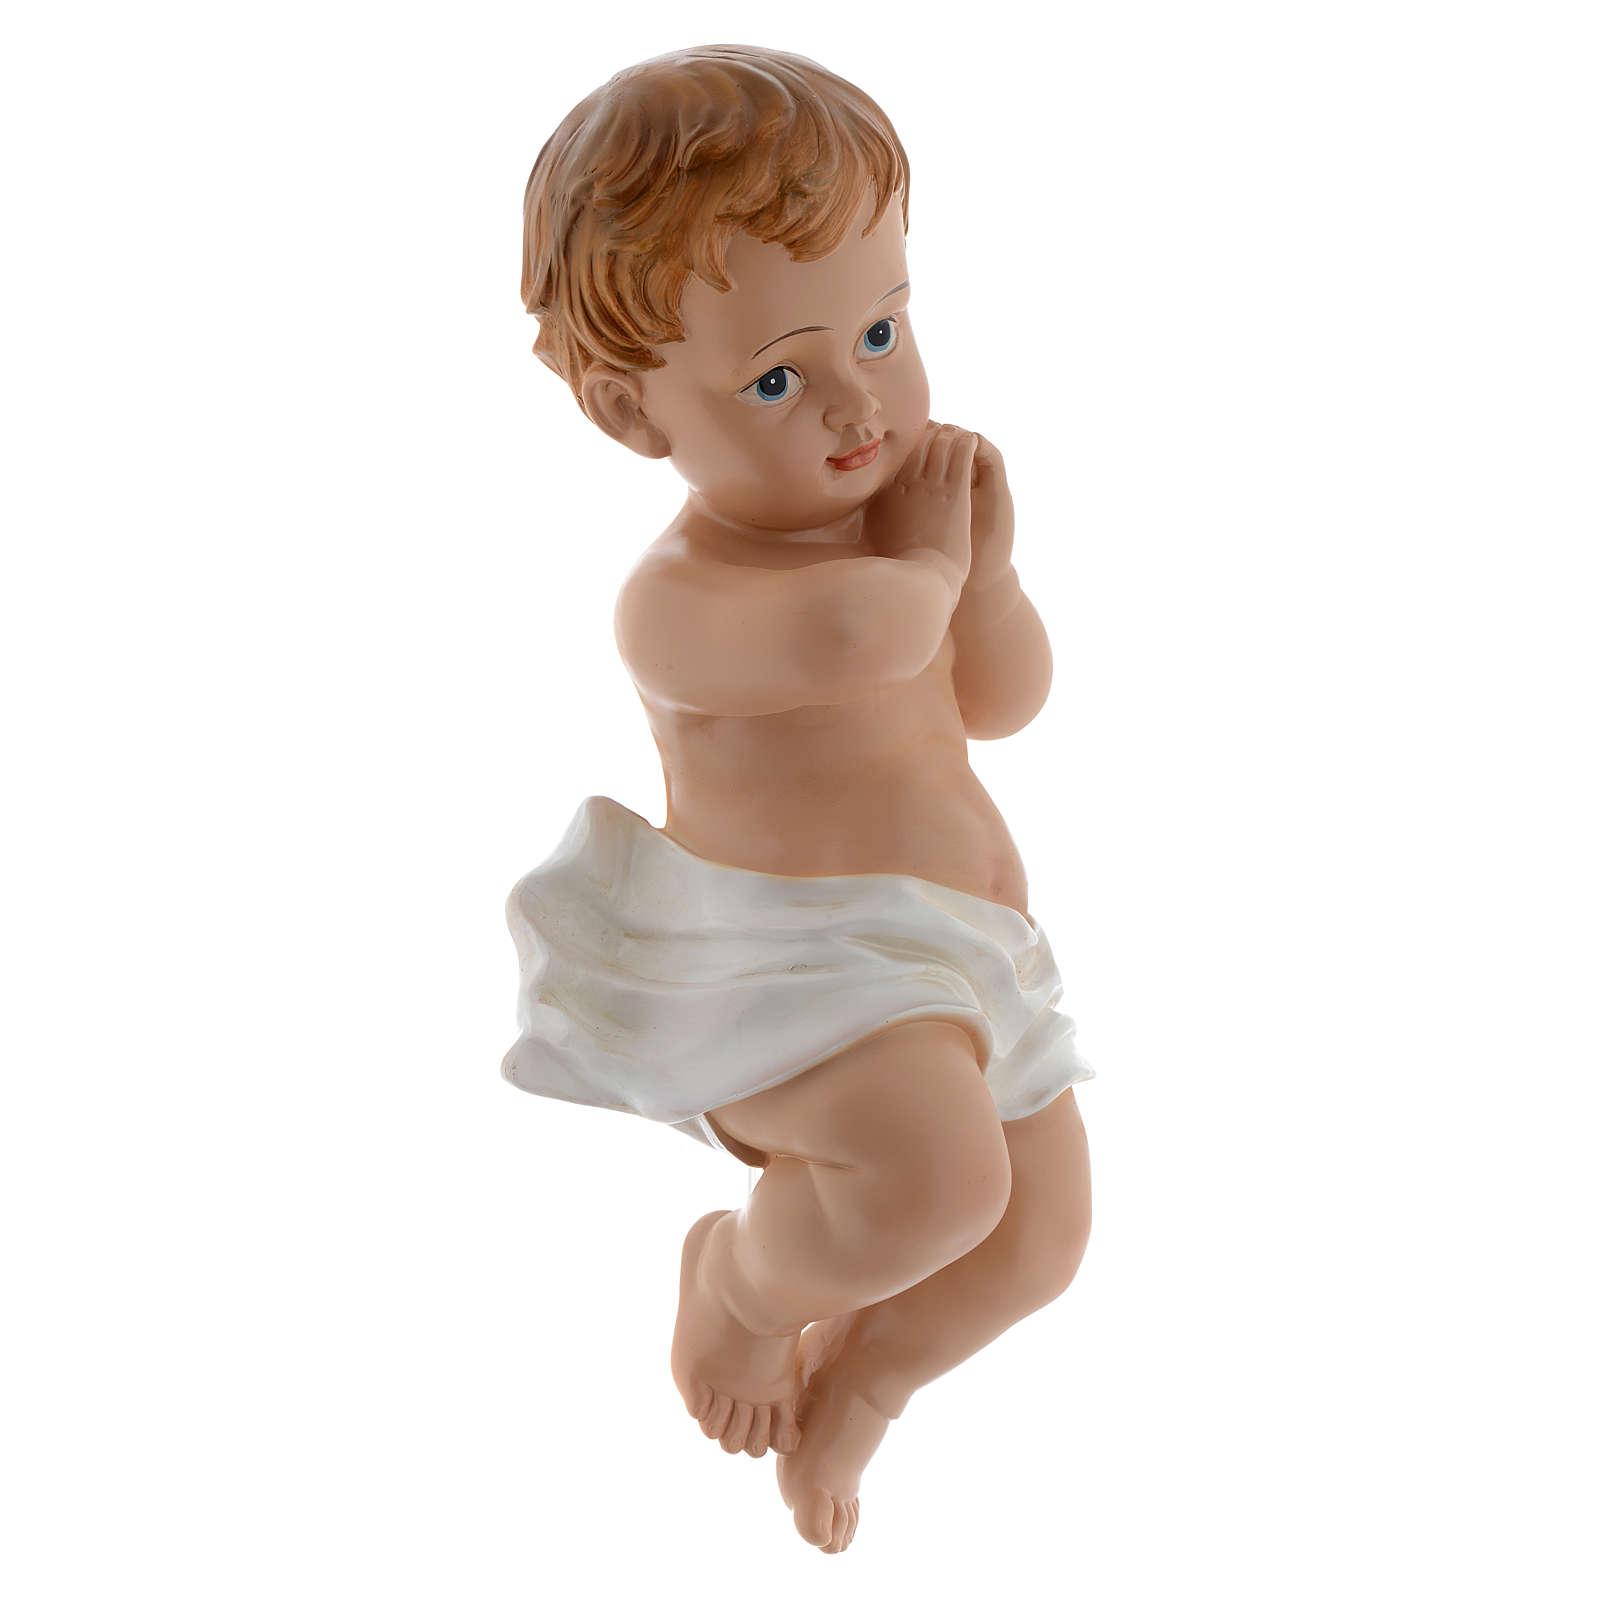 Baby Jesus statue 39,5 cm in resin 3